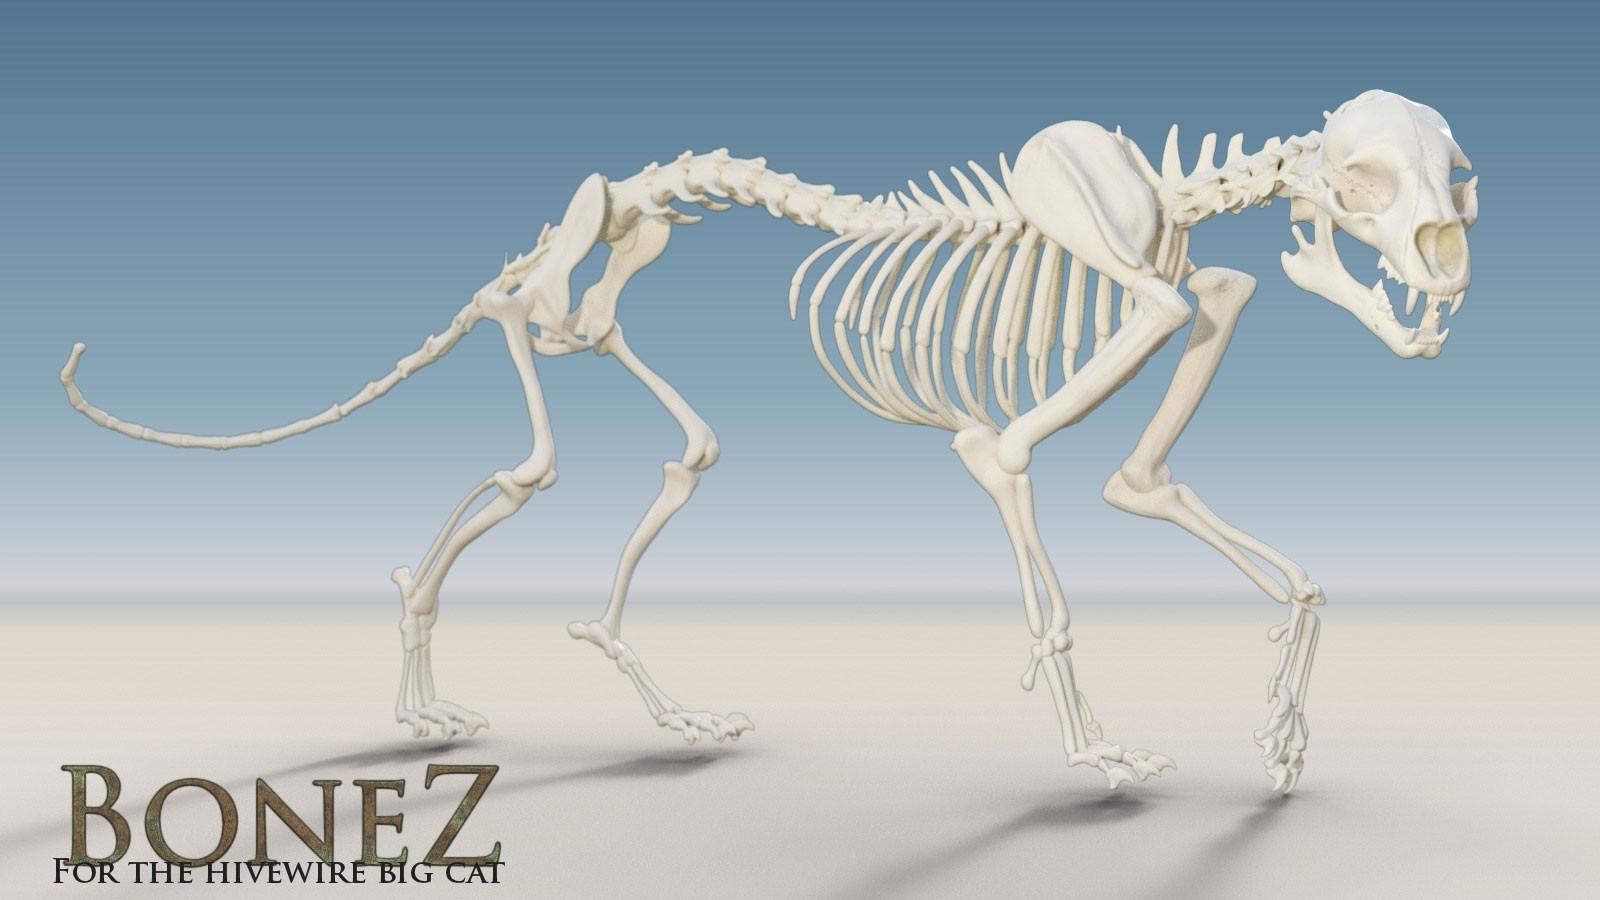 11556-bonez-for-the-hivewire-big-cat-main.jpg